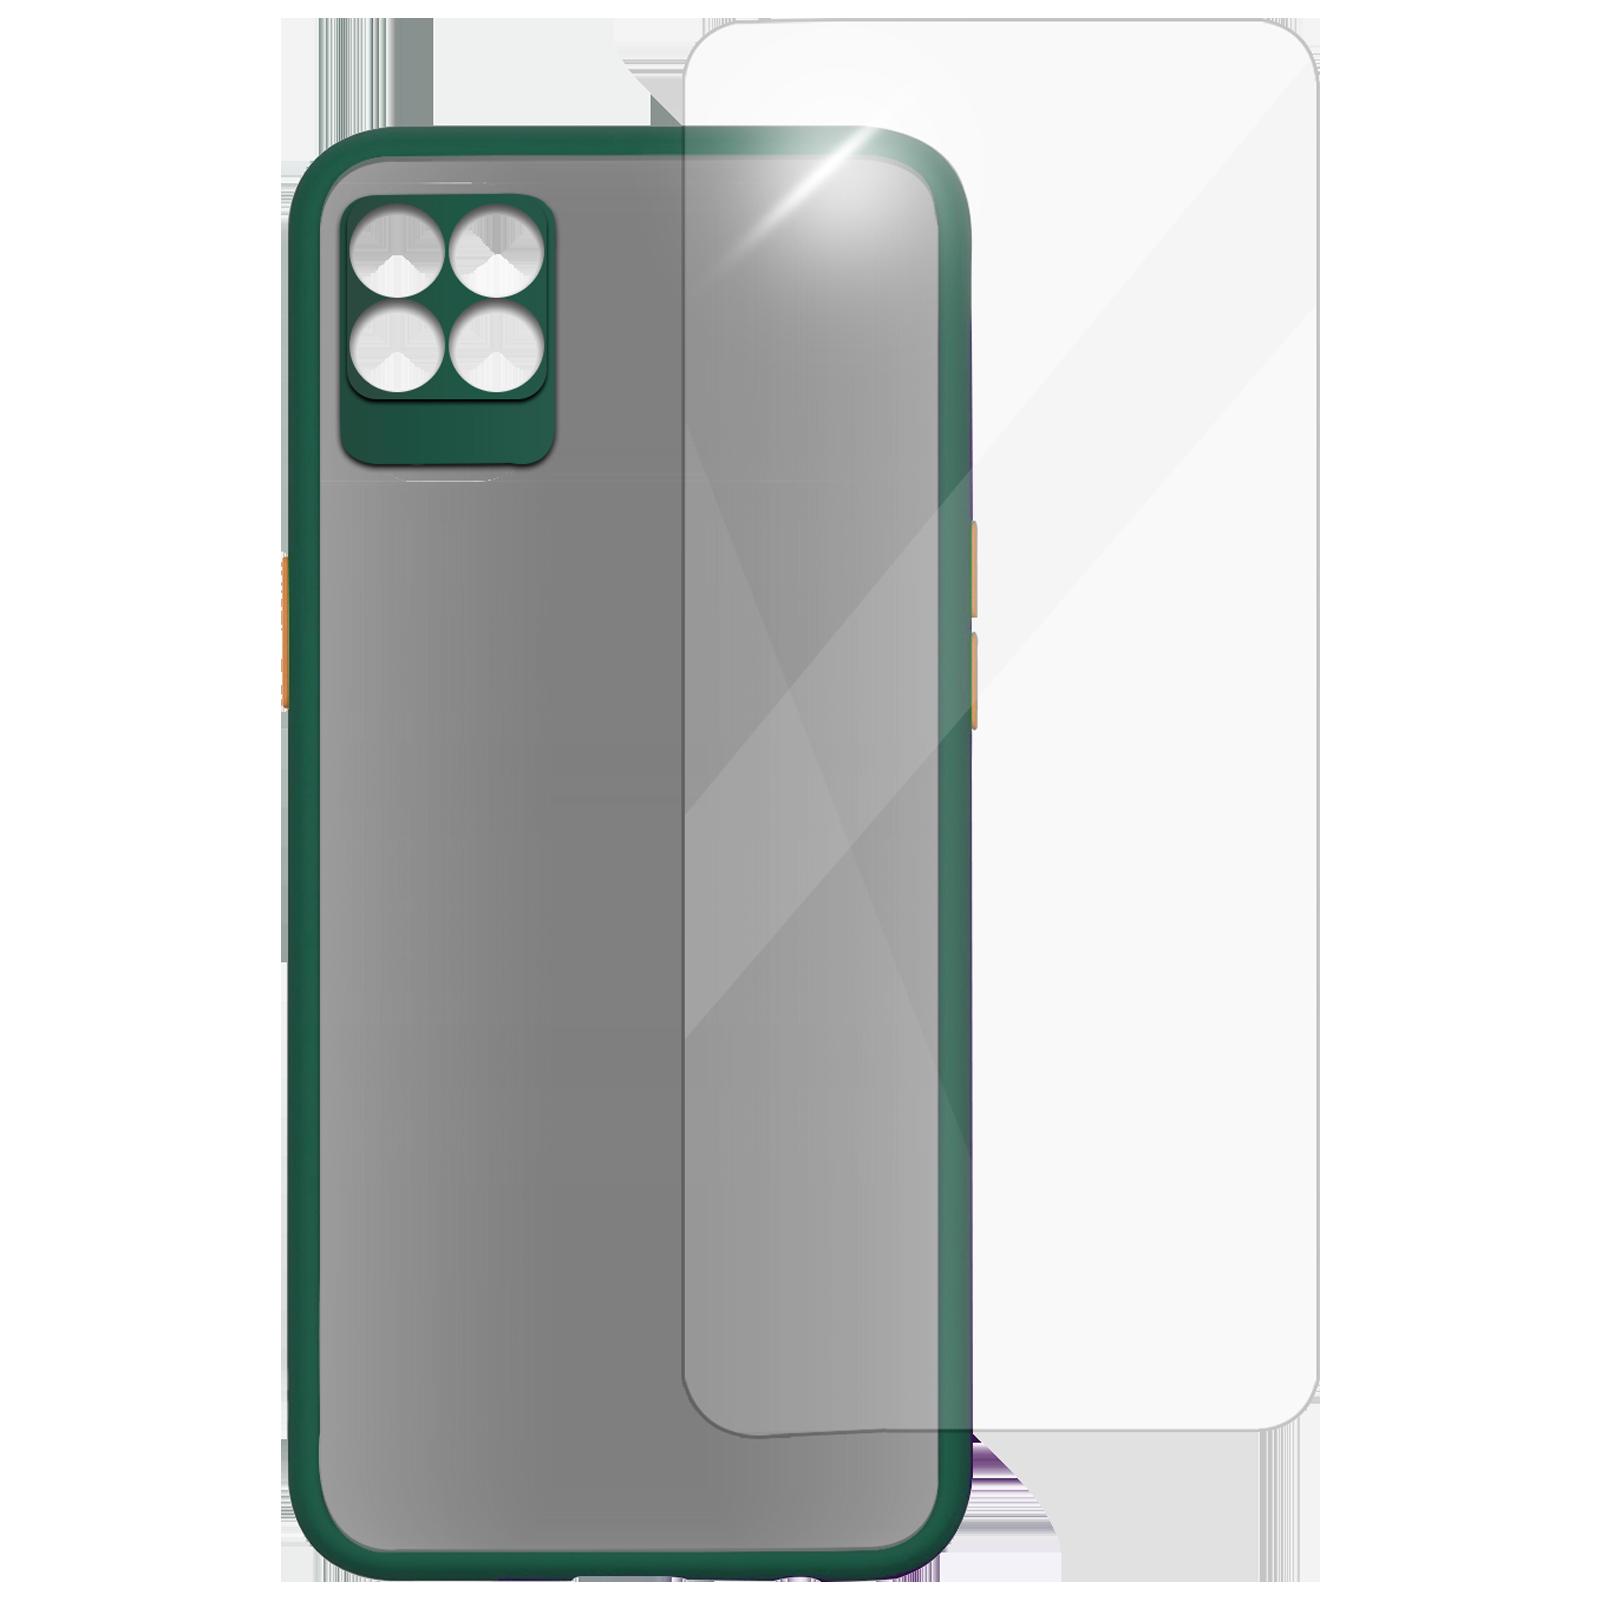 Arrow Camera Duplex Back Case and Screen Protector Bundle For Realme 8 (Ultra Transparent Visibility, AR-1041, Dark Green)_1